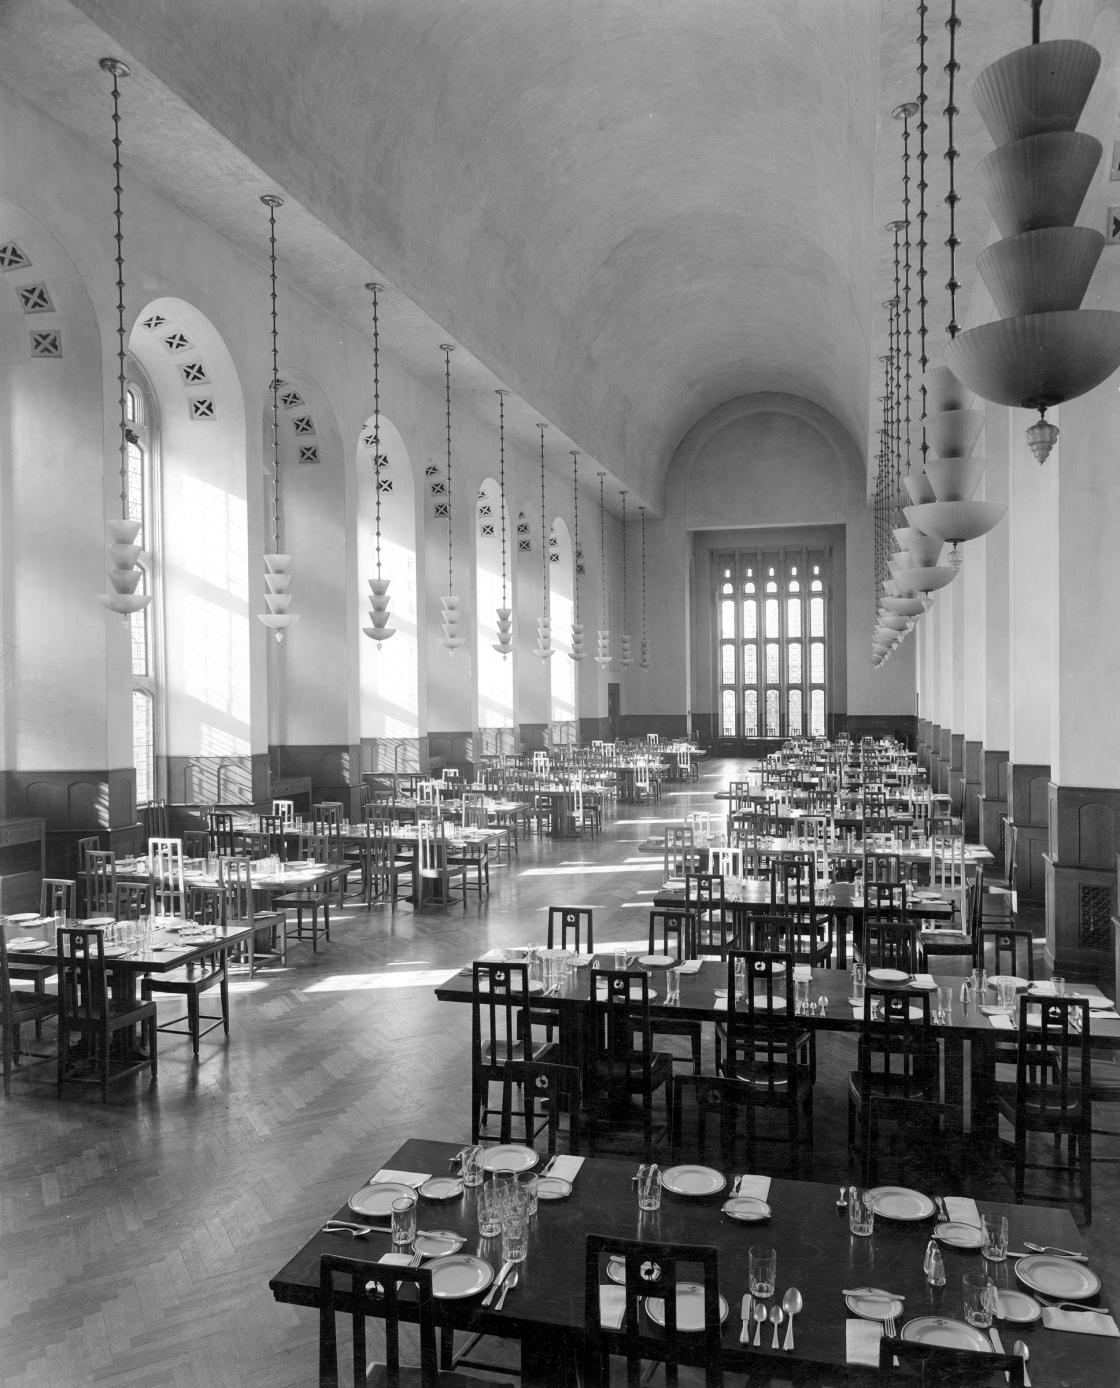 Cranbrook School Dining Hall set for dinner, October 1936. Courtesy Cranbrook Archives.